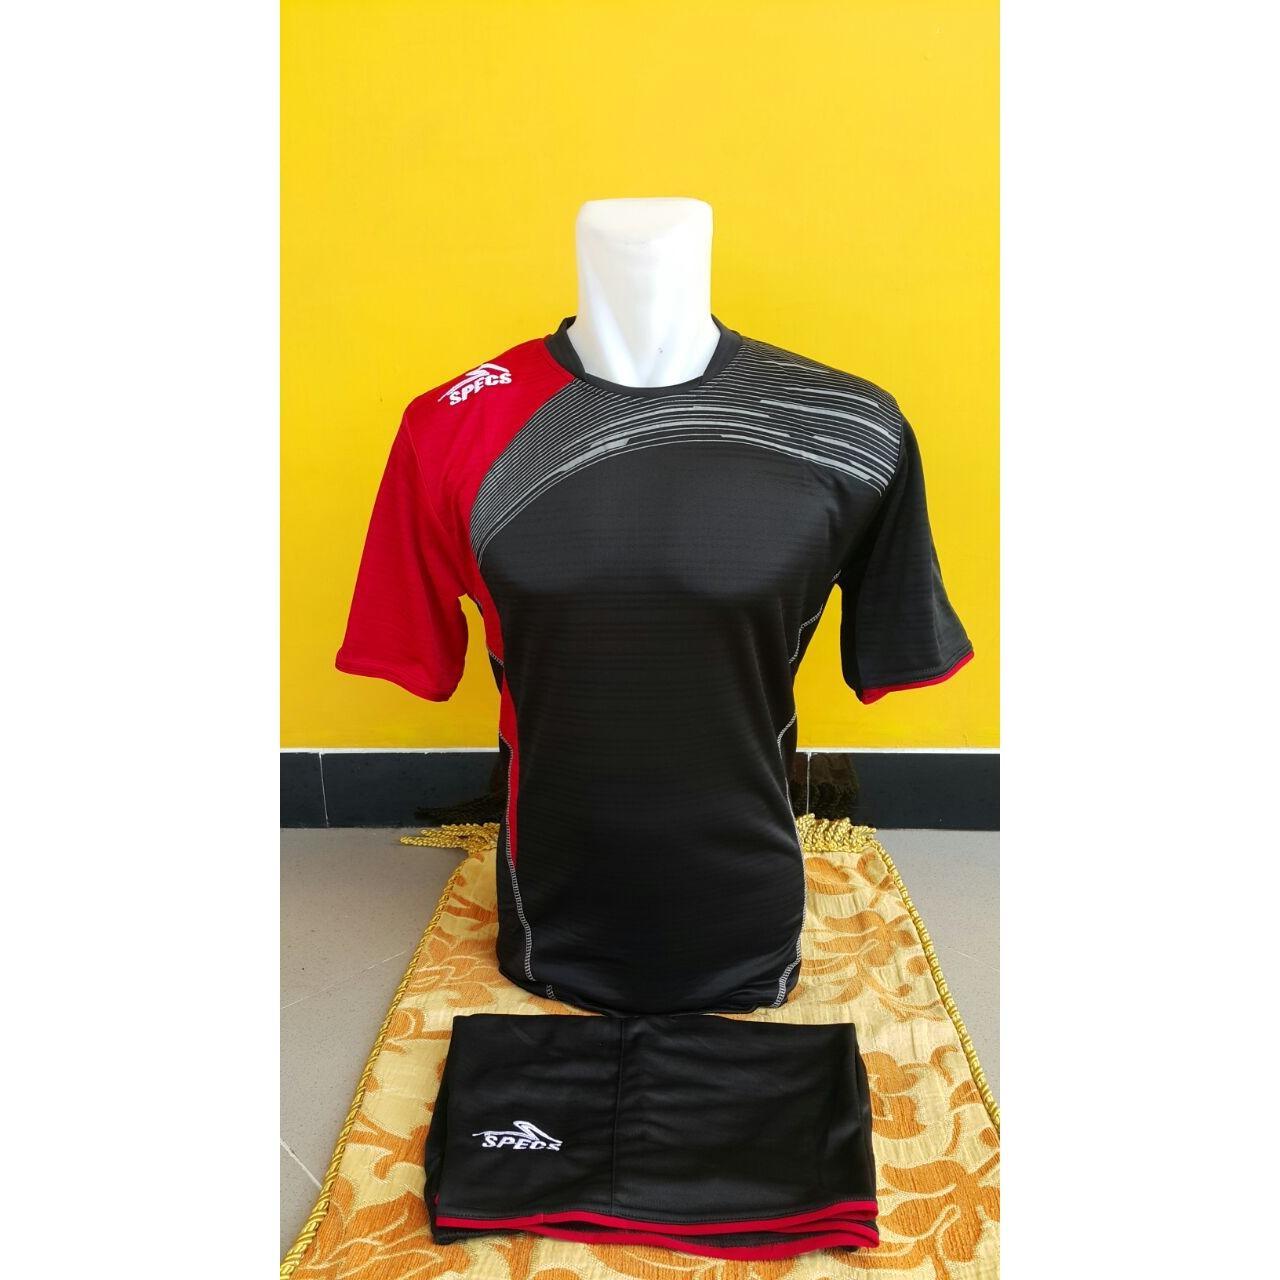 Kostum Kaos Sepakbola Futsal Volly Takraw All Size Drifit Printing Hijau Plus Celana Pendek k3.4